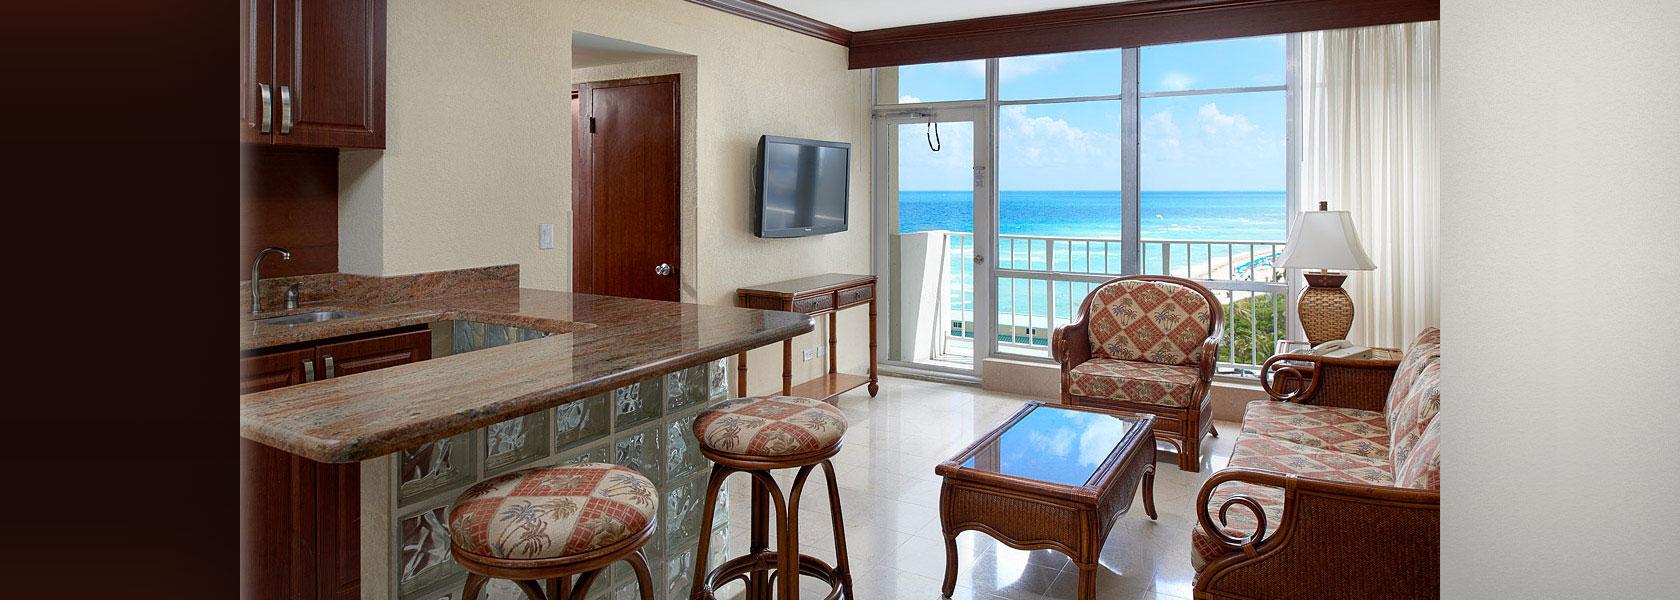 Newport Beachside Hotel Room